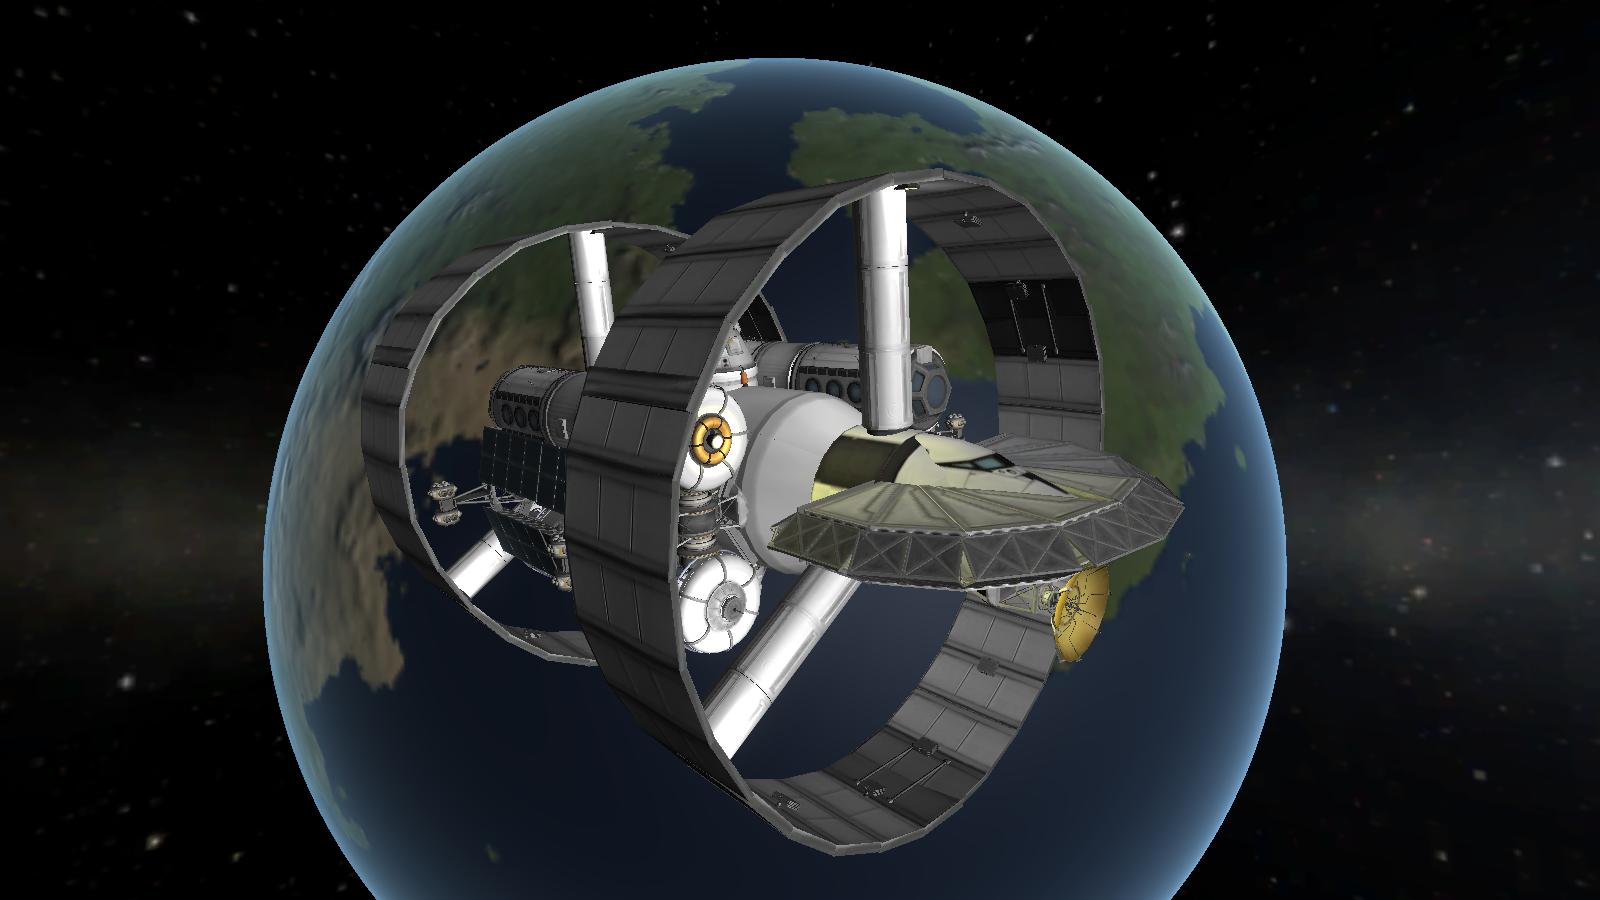 The Kerbal Version Of NASA's Warp Drive Ship Is Just As Cool